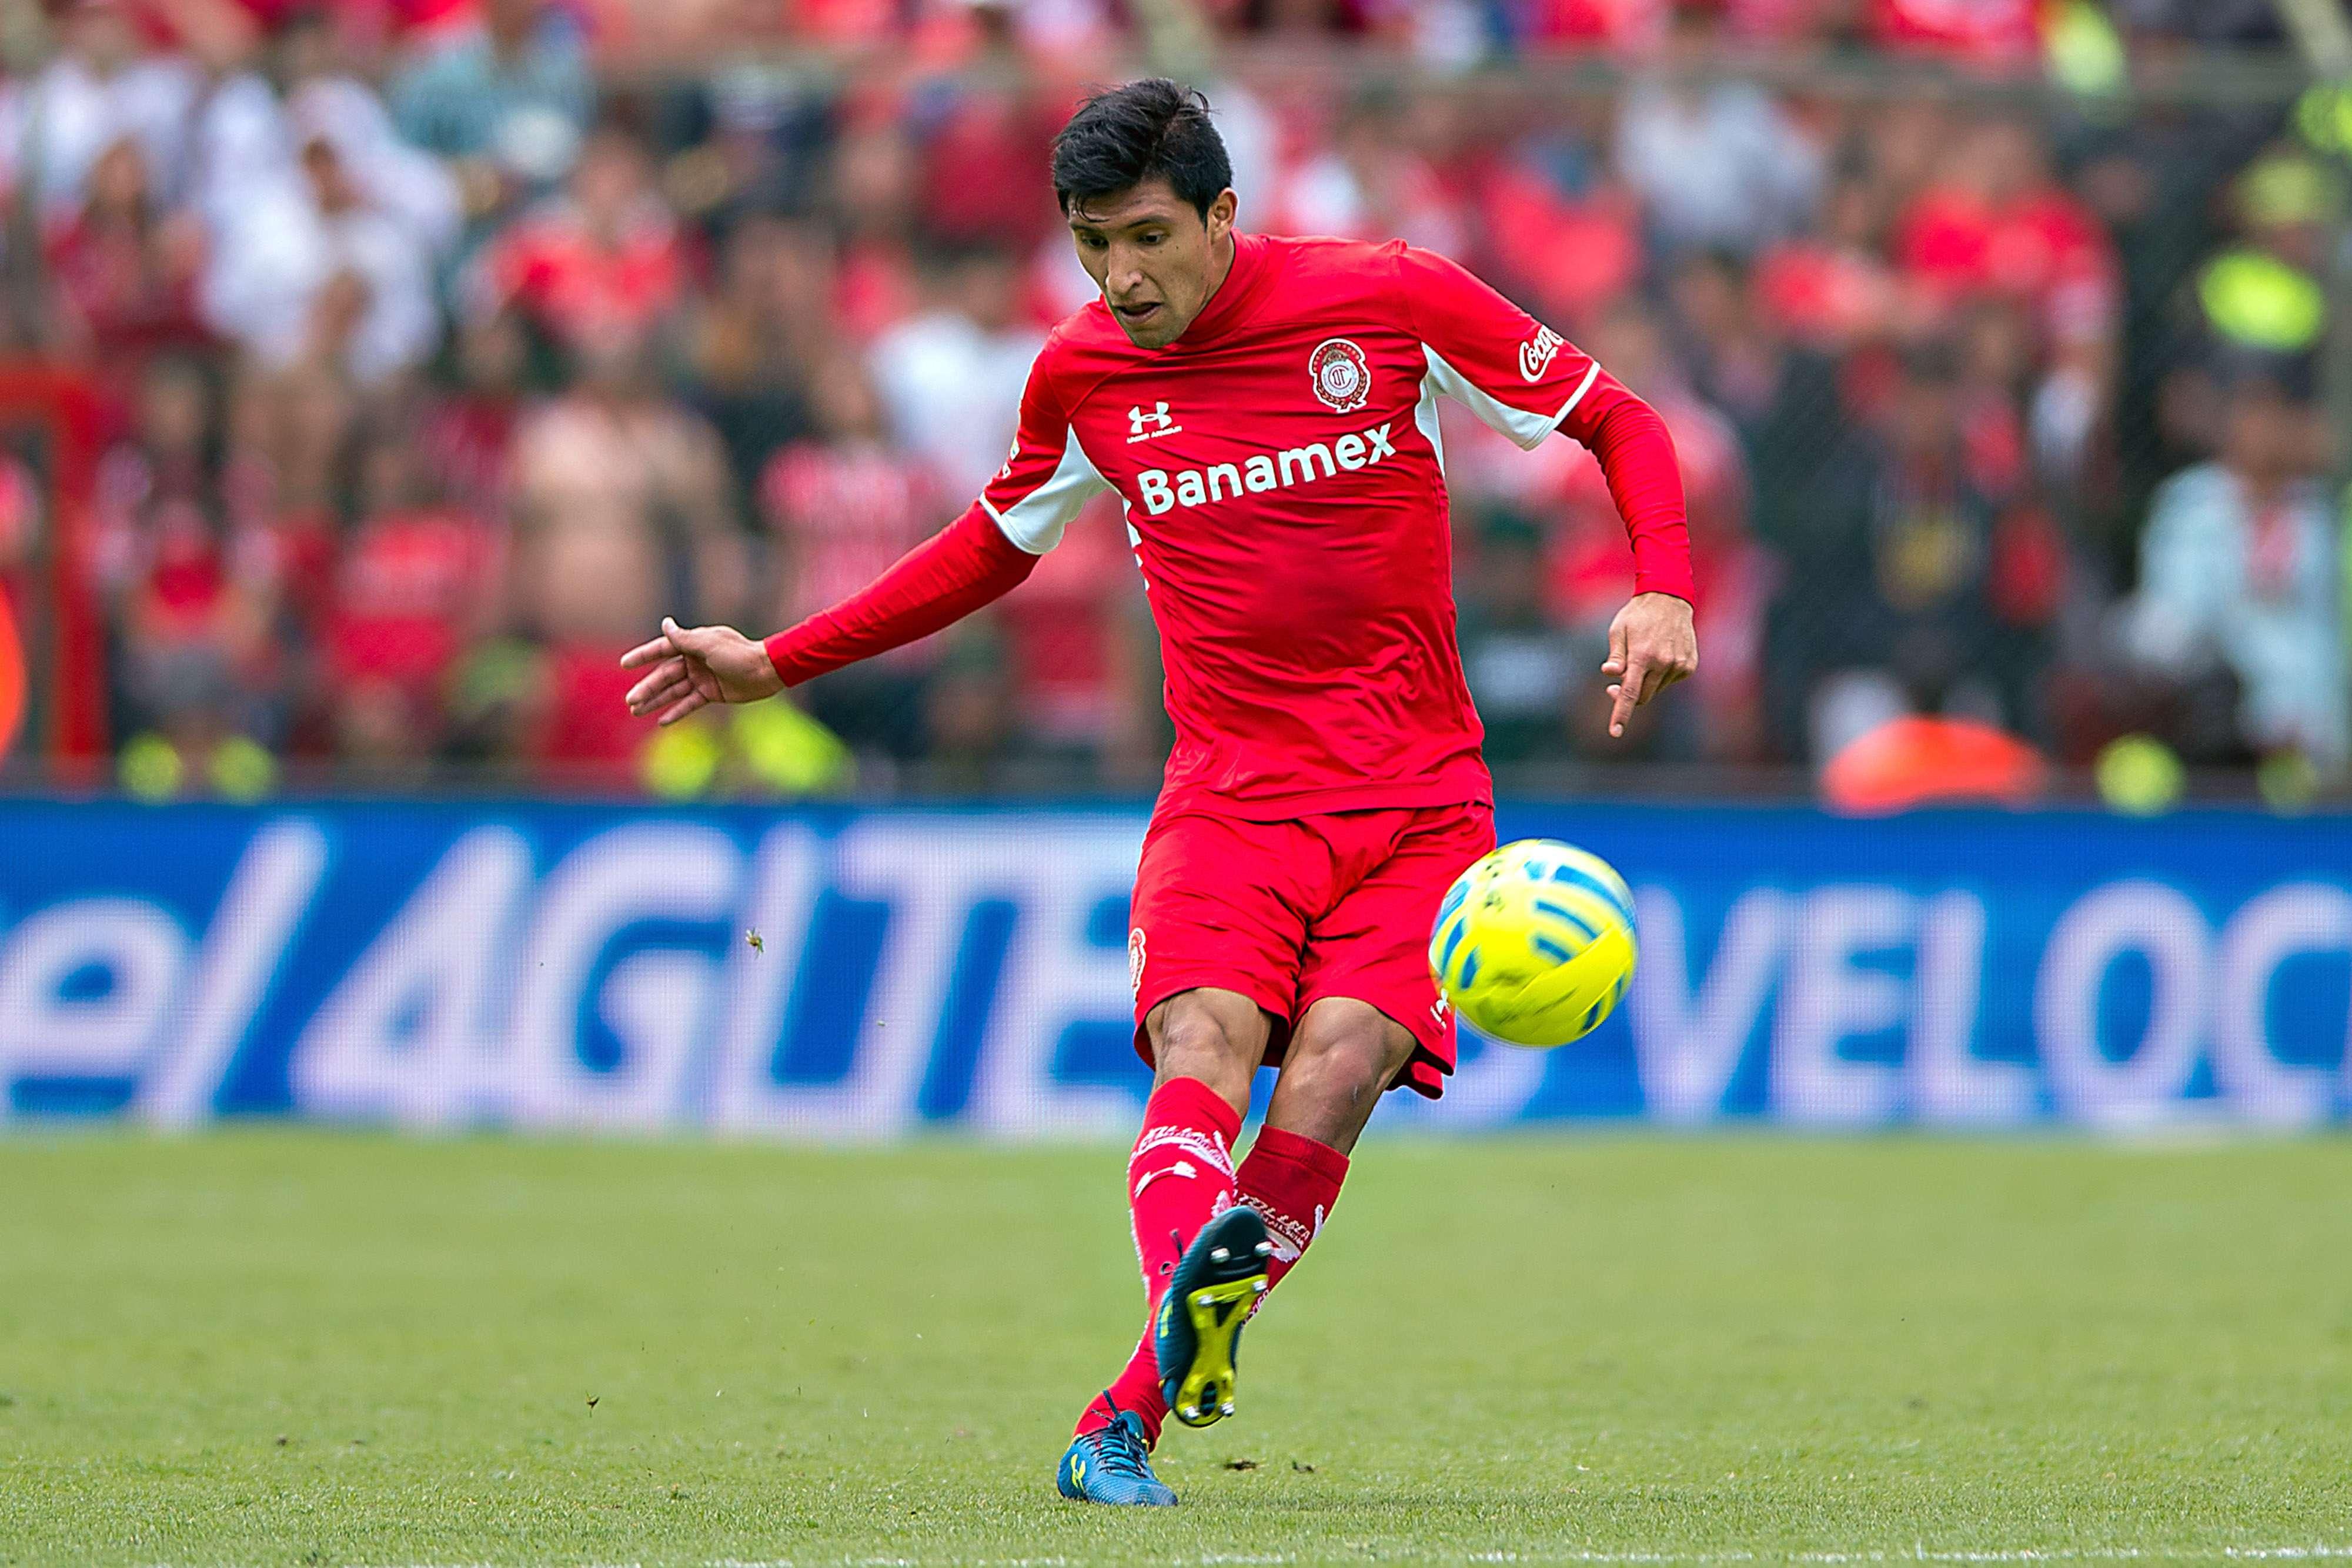 Jordan Silva juega su tercer torneo como defensa de Toluca. Foto: Mexsport